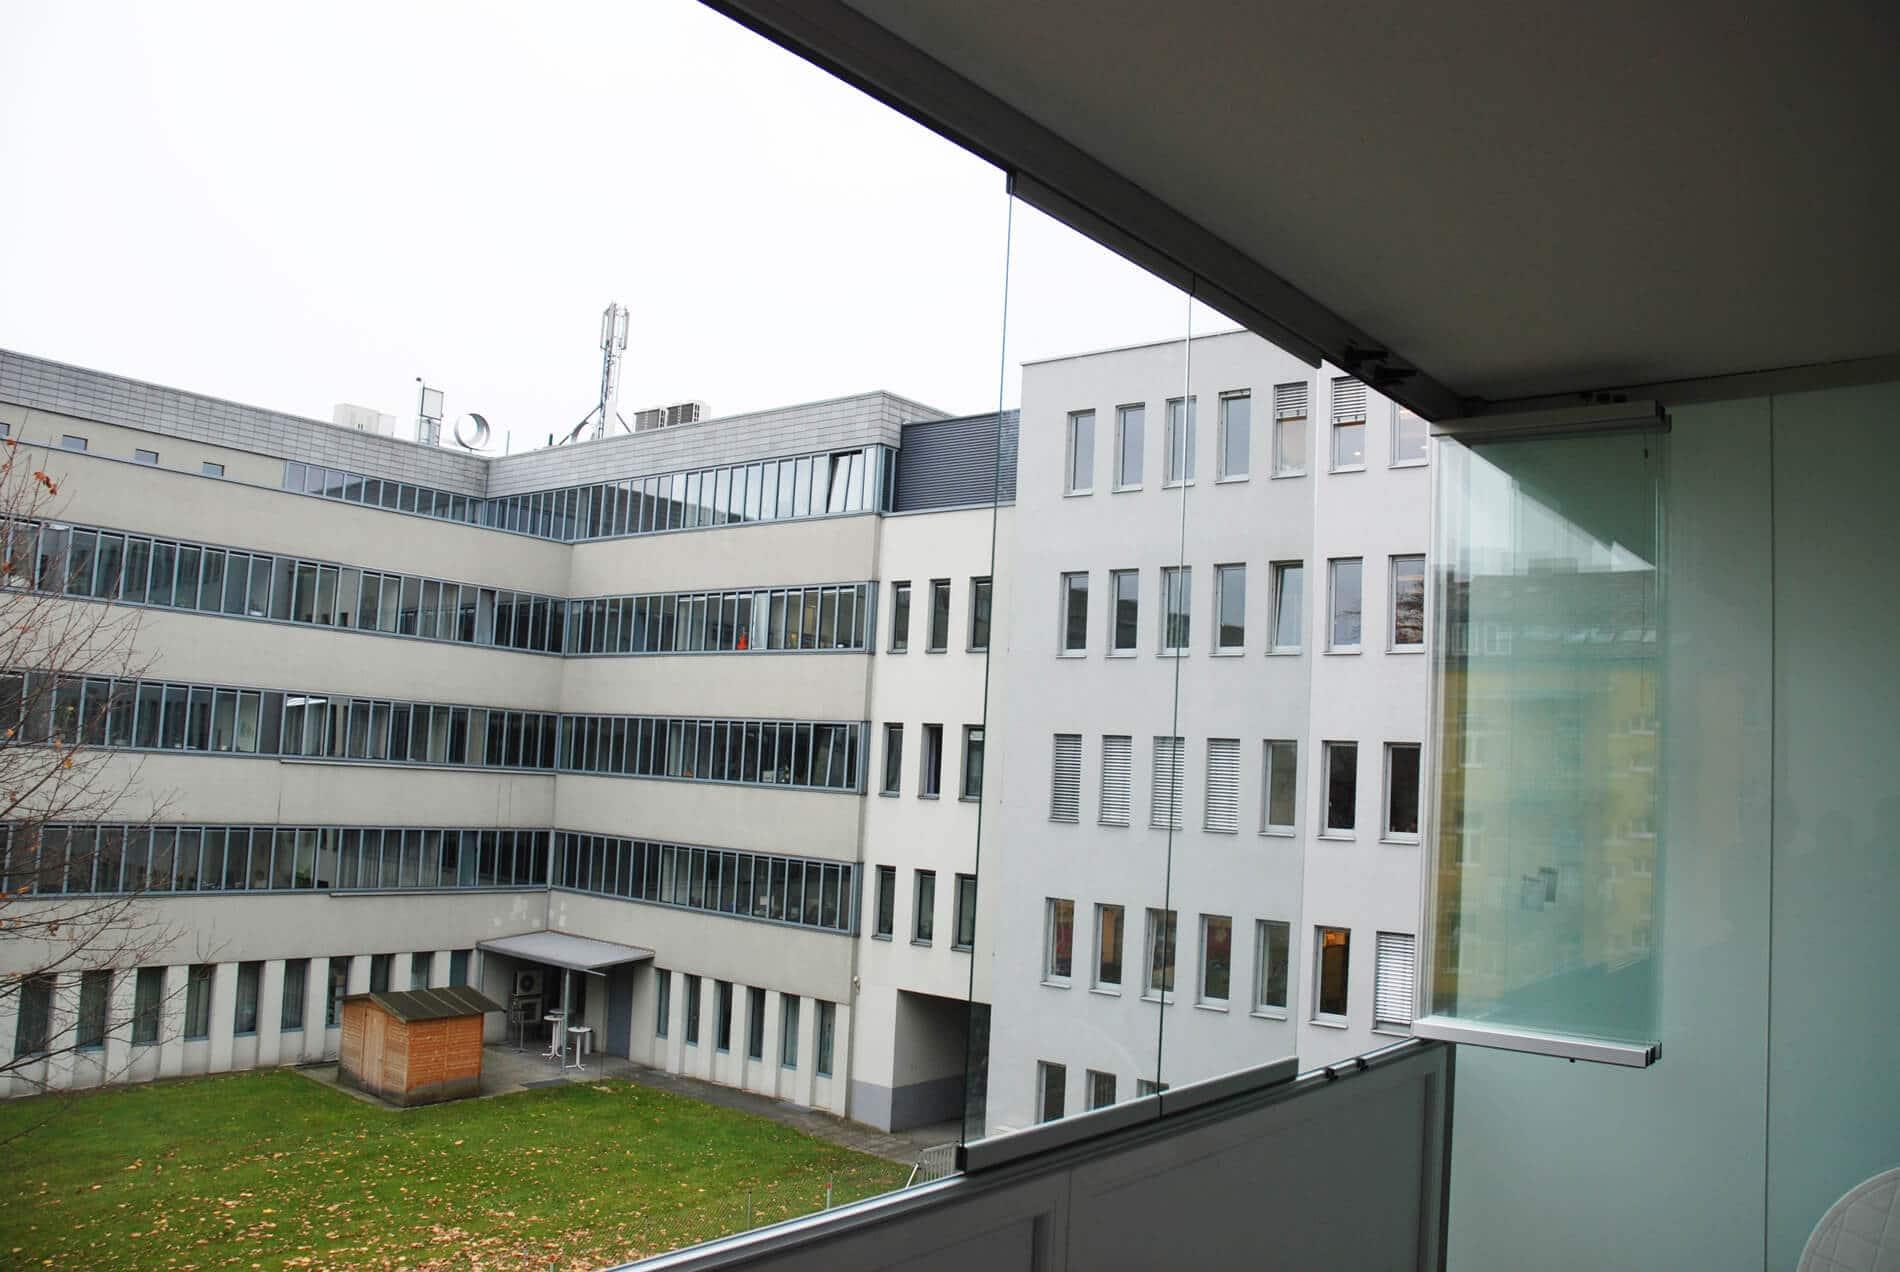 Faltwand Balkonverglasung